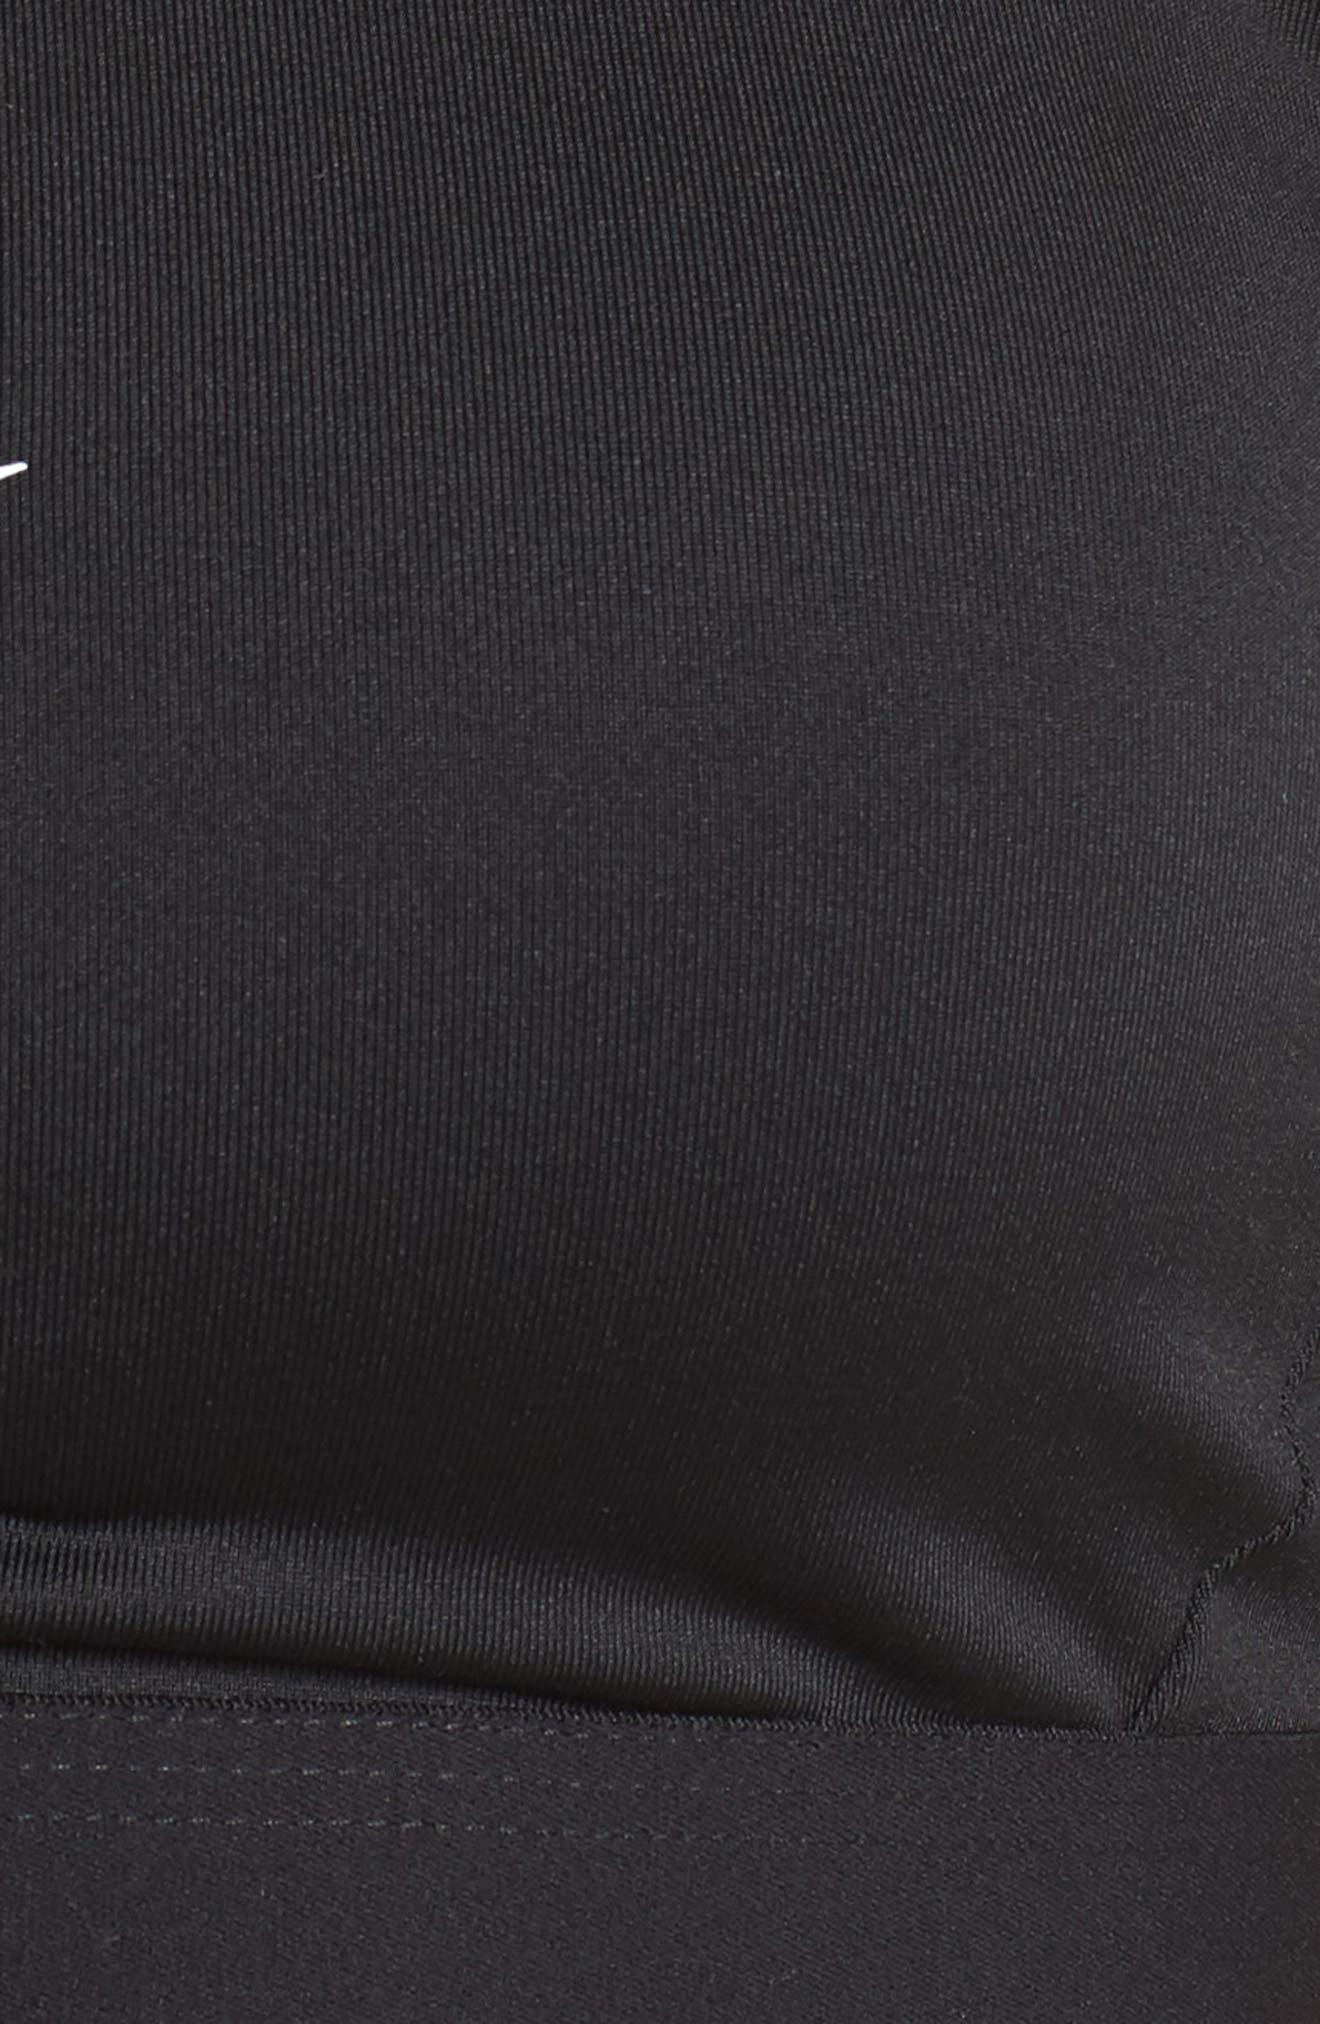 Classic Strappy Sports Bra,                             Alternate thumbnail 8, color,                             BLACK/ WHITE/ WHITE